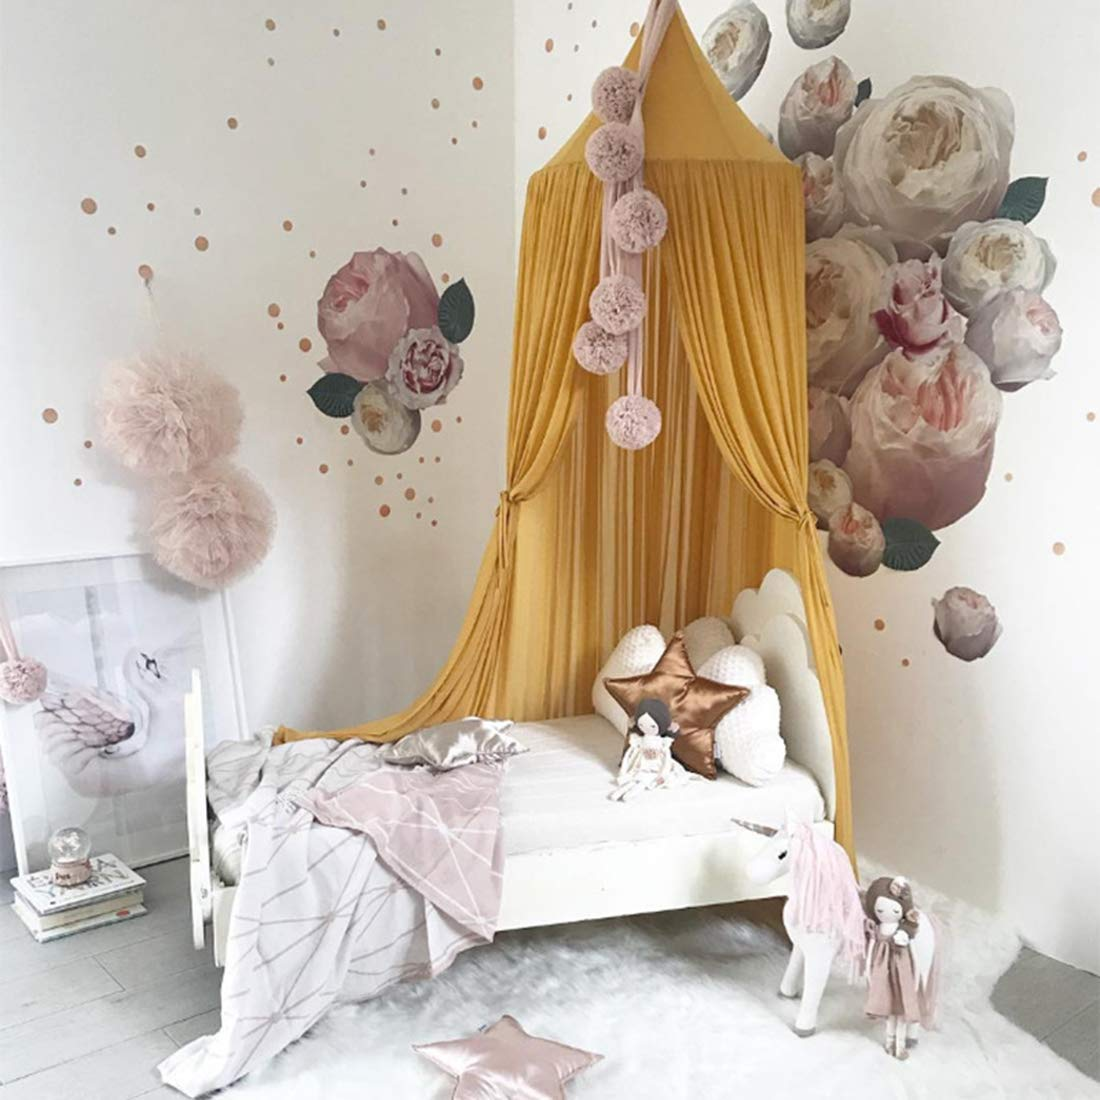 Gelb K9CK Betthimmel Baby Baldachin Betthimmel Kinder Babys Bett aus Chiffon Insektennetz Deko Moskitonetz f/ür Kinderbett